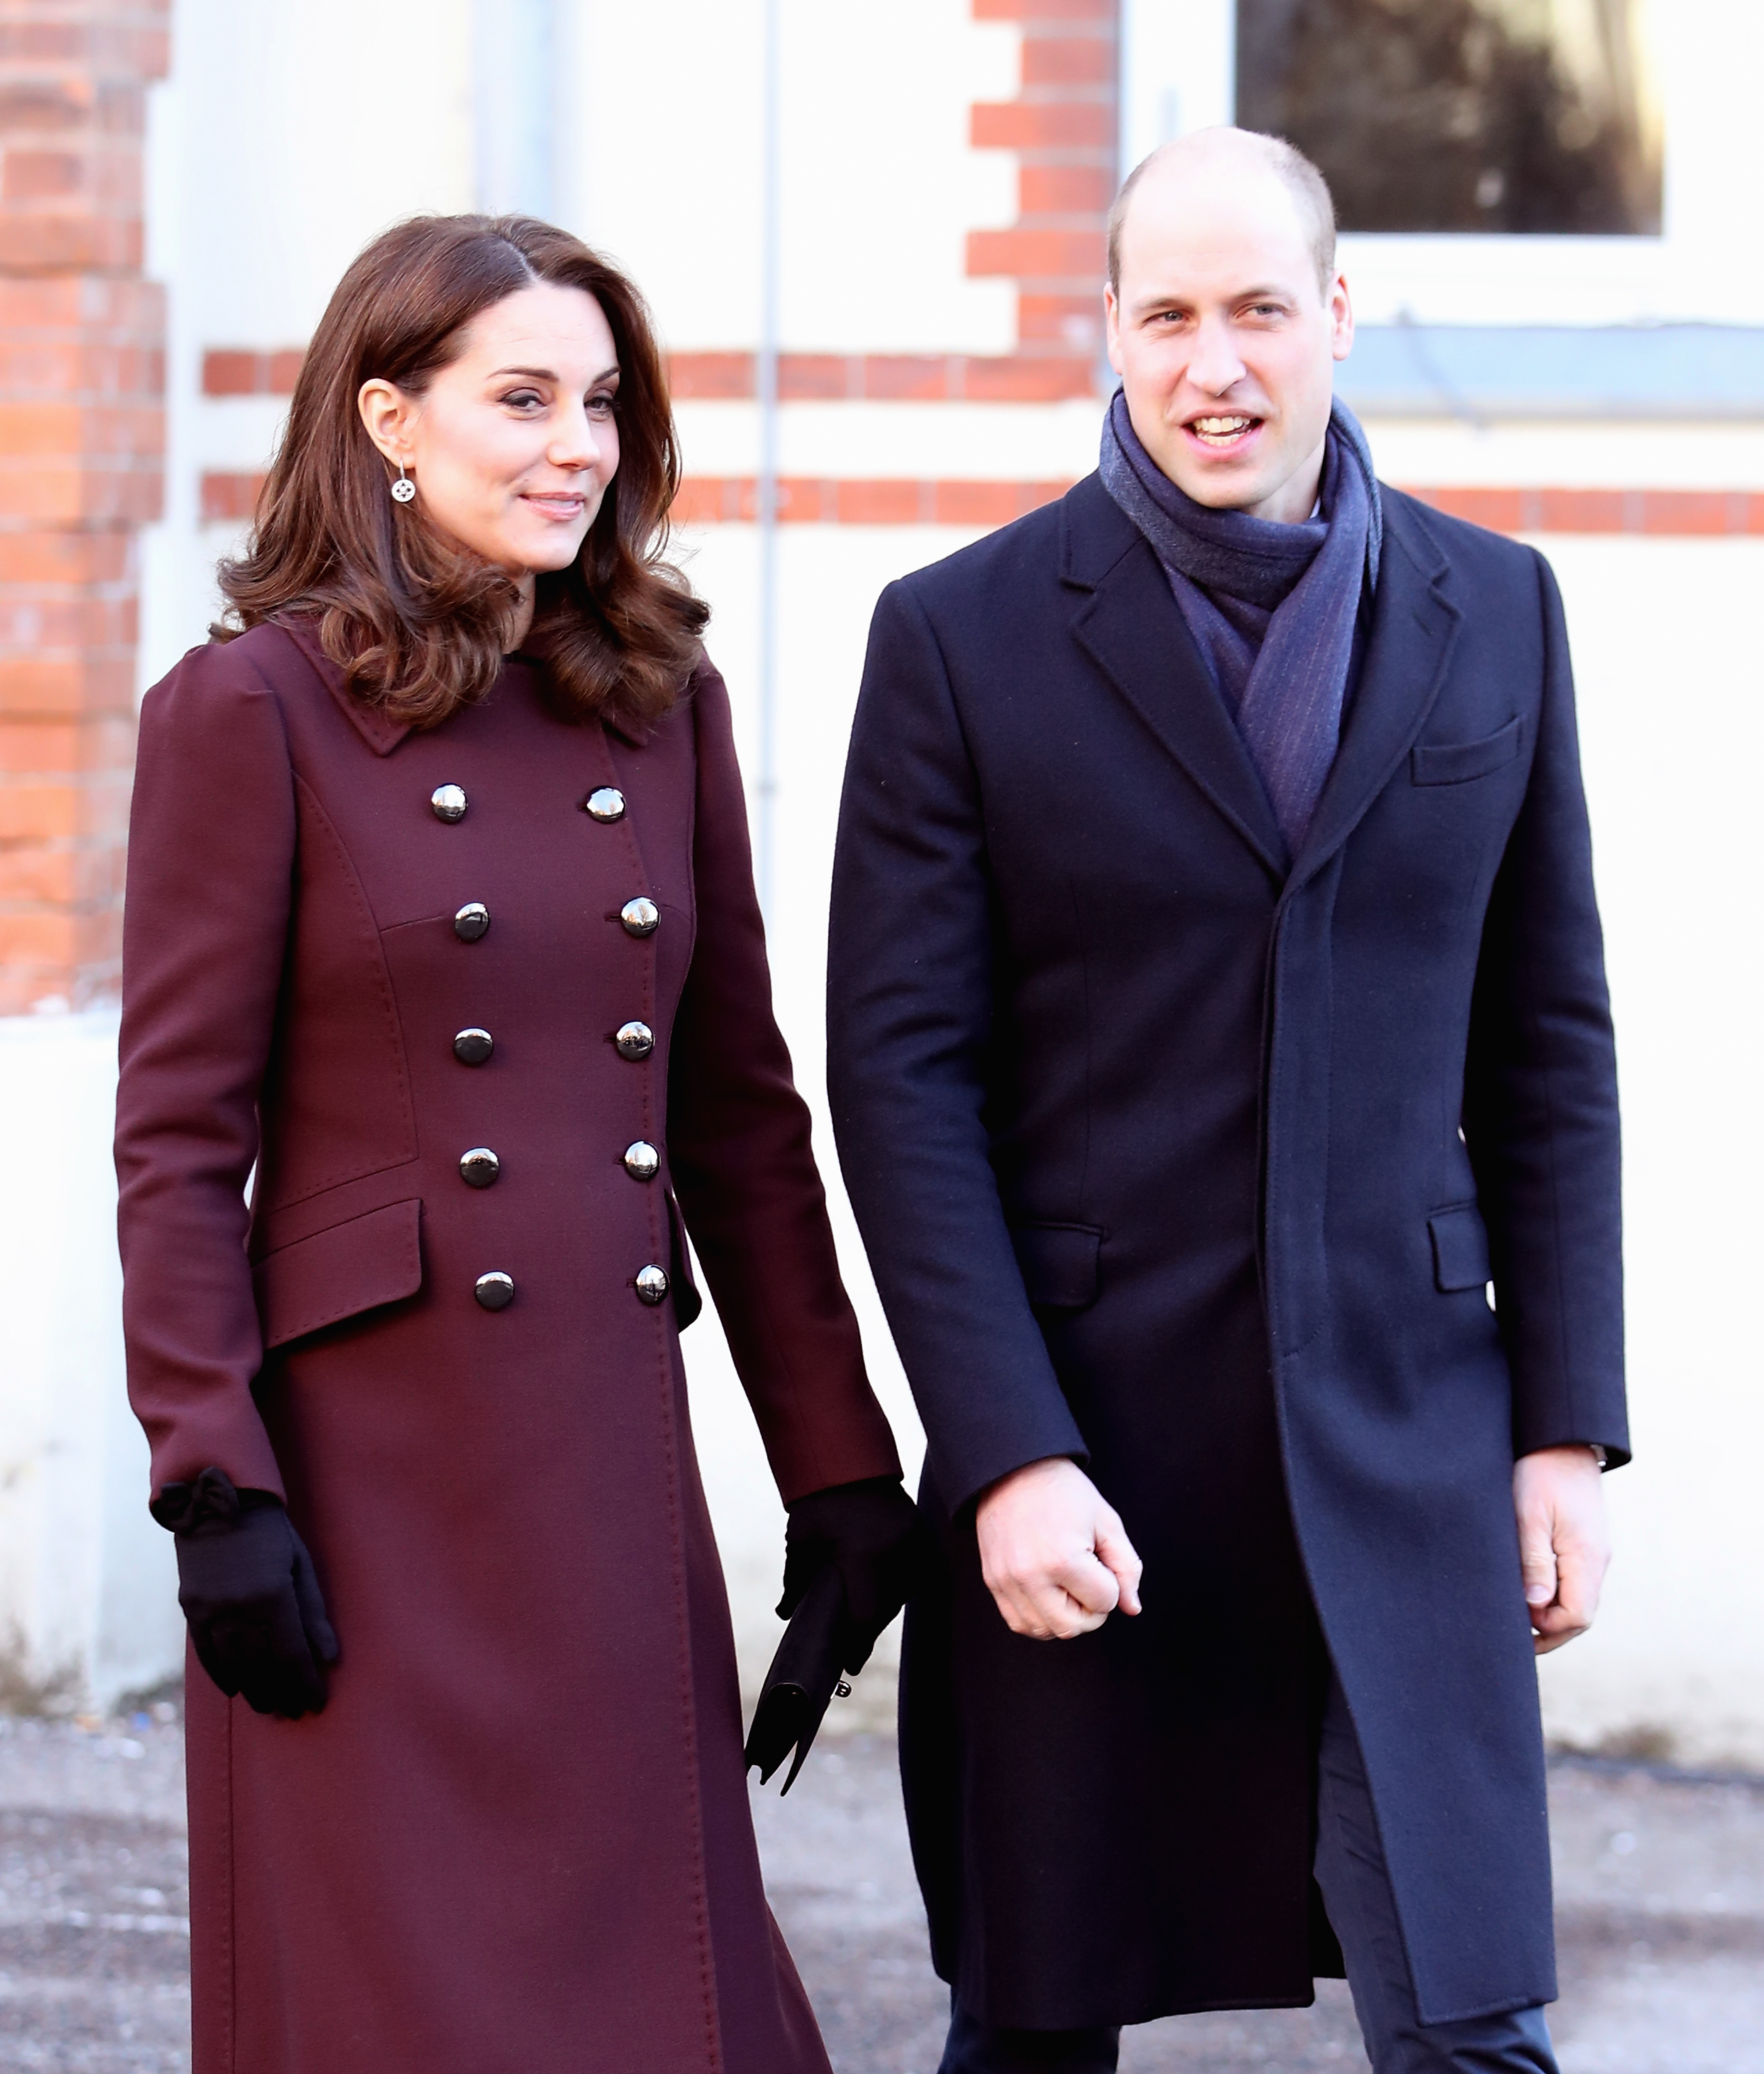 William and Kate visit Sweden